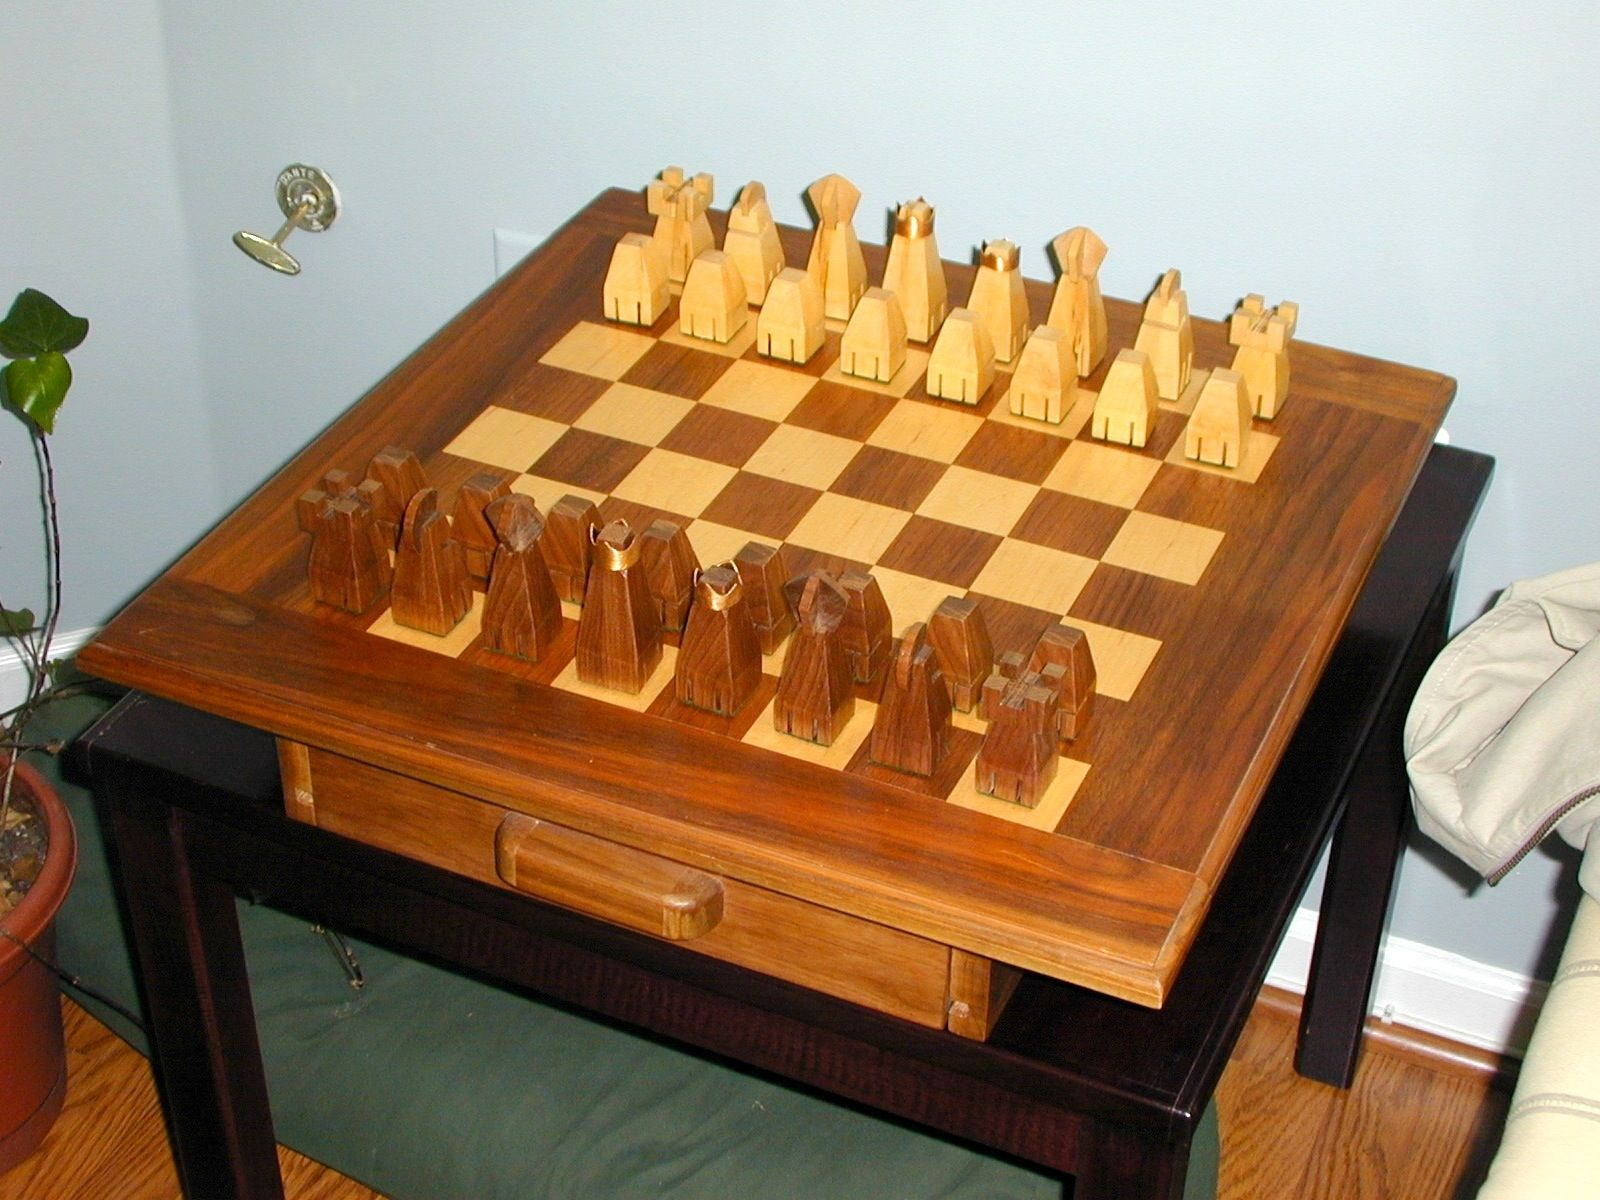 Custom made chess set and board